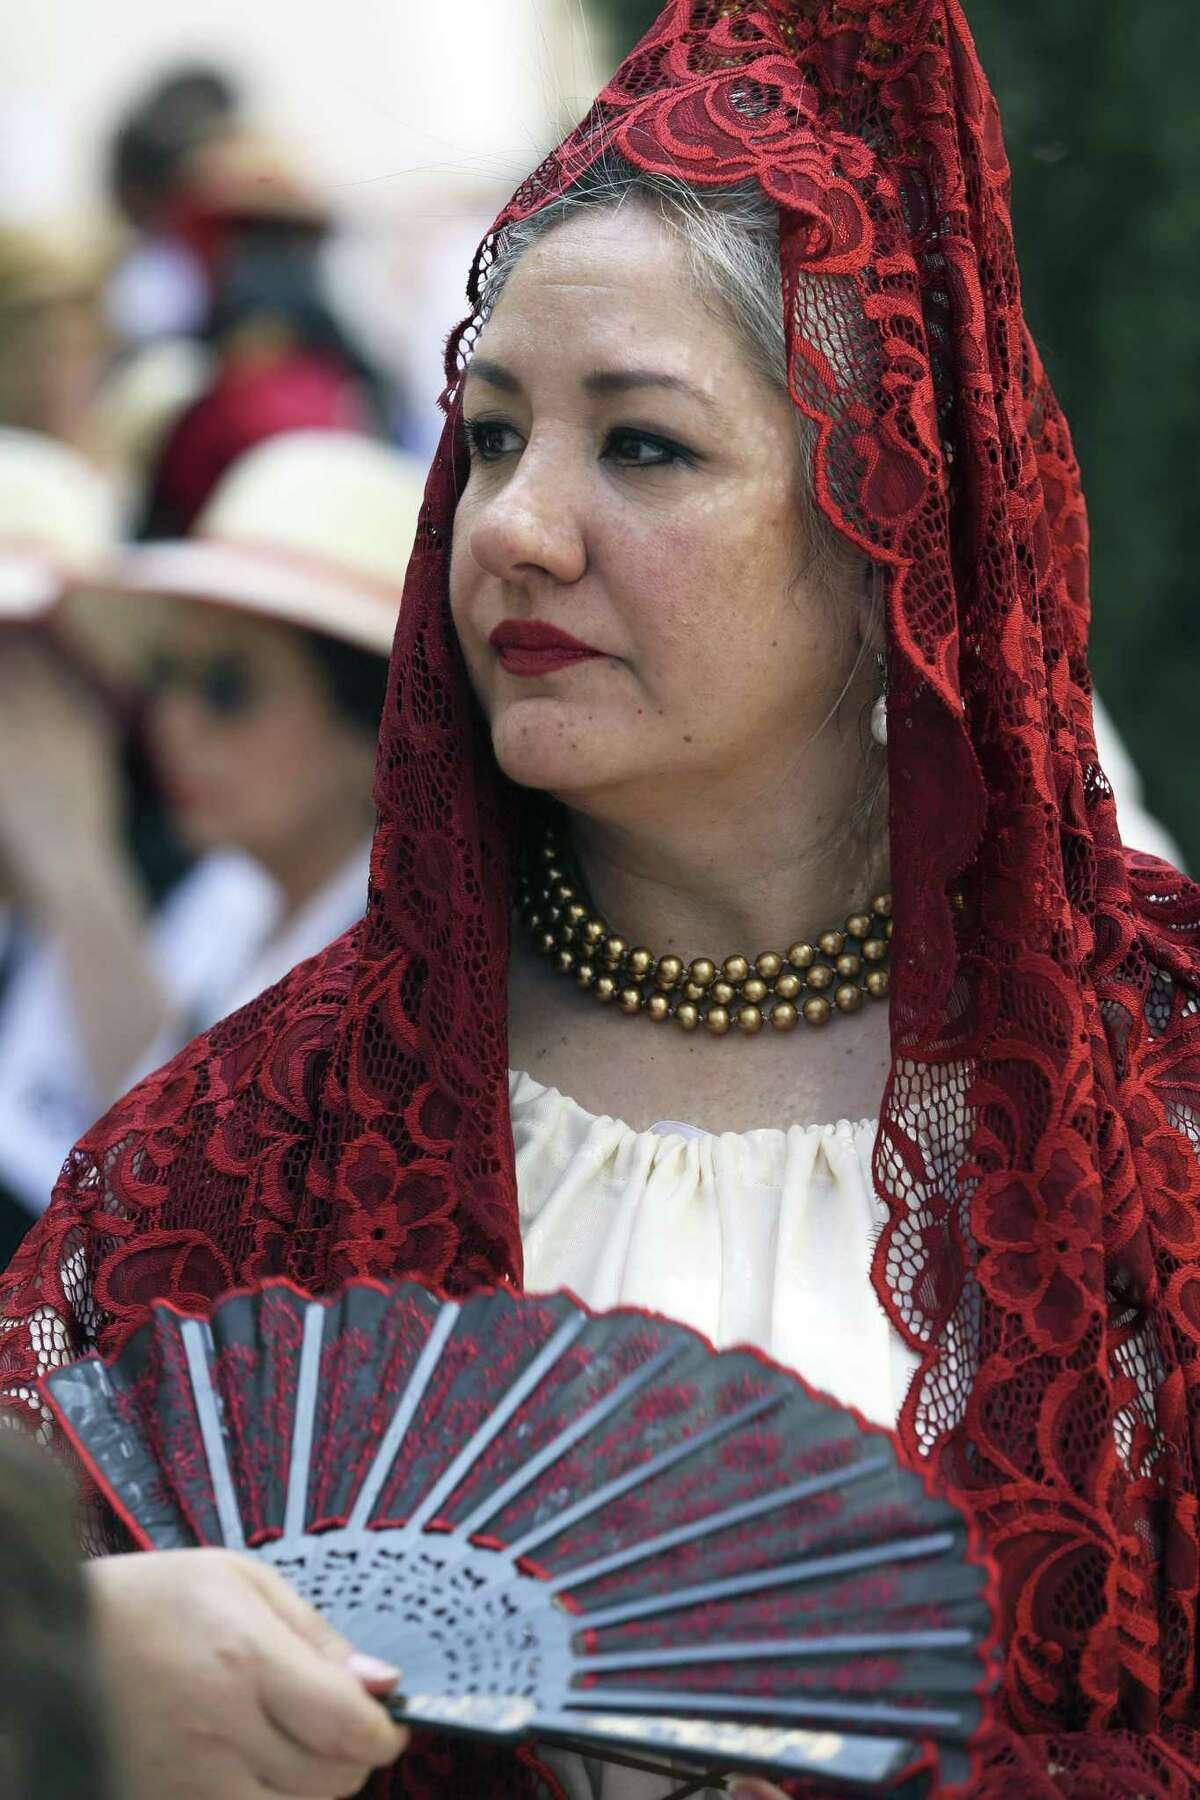 Jo Anne Gonzalez Murphy represents the wife of a 1718 Presidio San Antonio de Béjar soldier as historical and genealogical organizations present